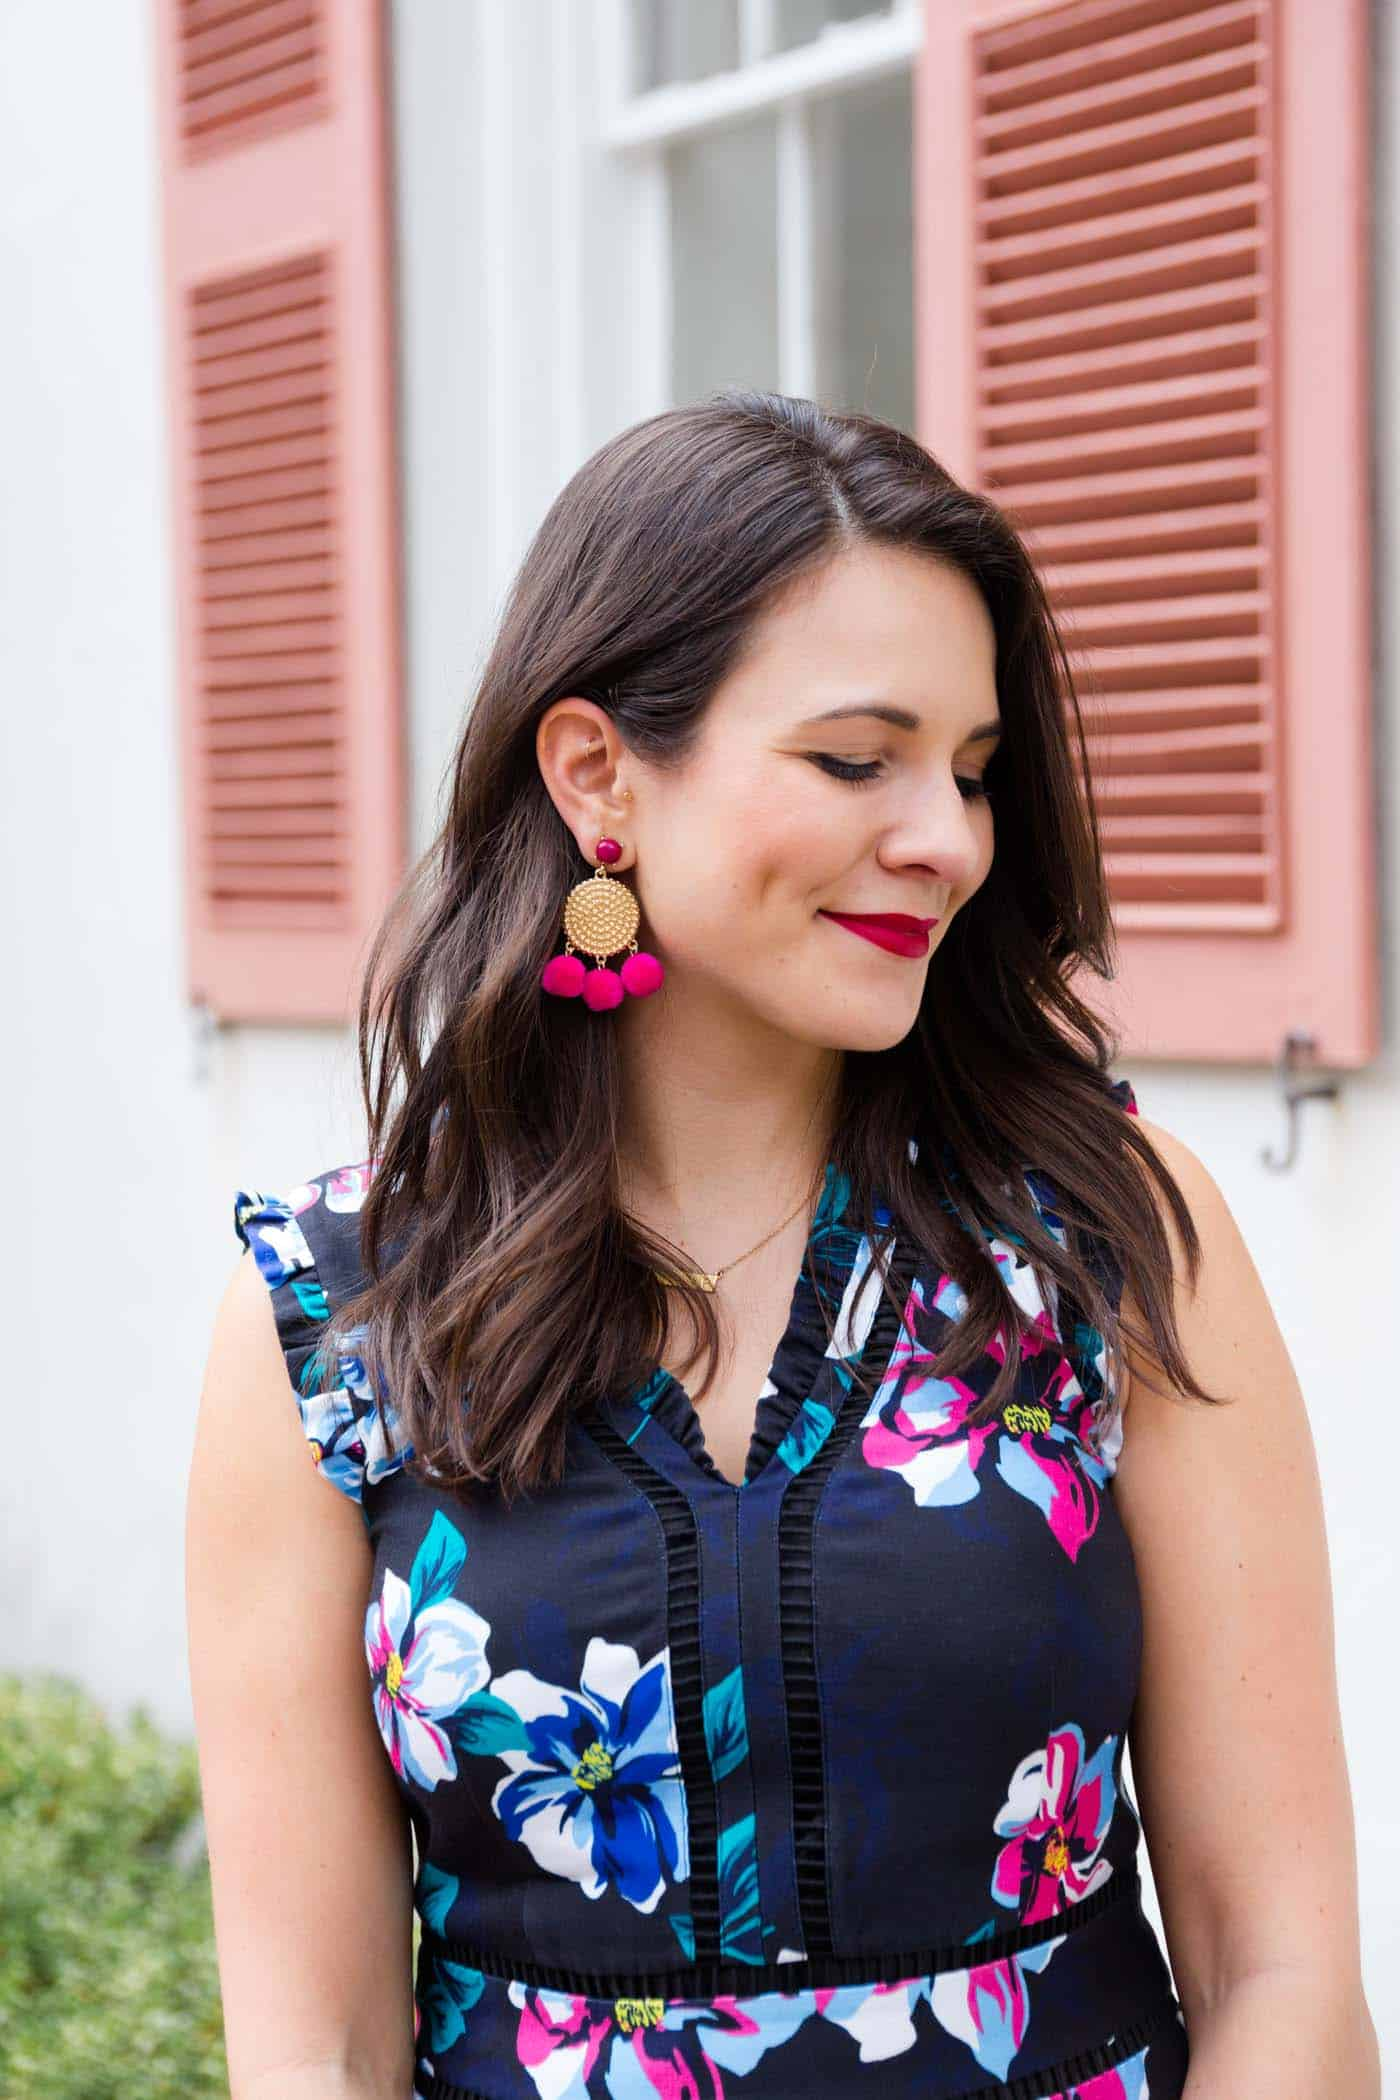 statement earrings, floral dress - My Style Vita @mystylevita